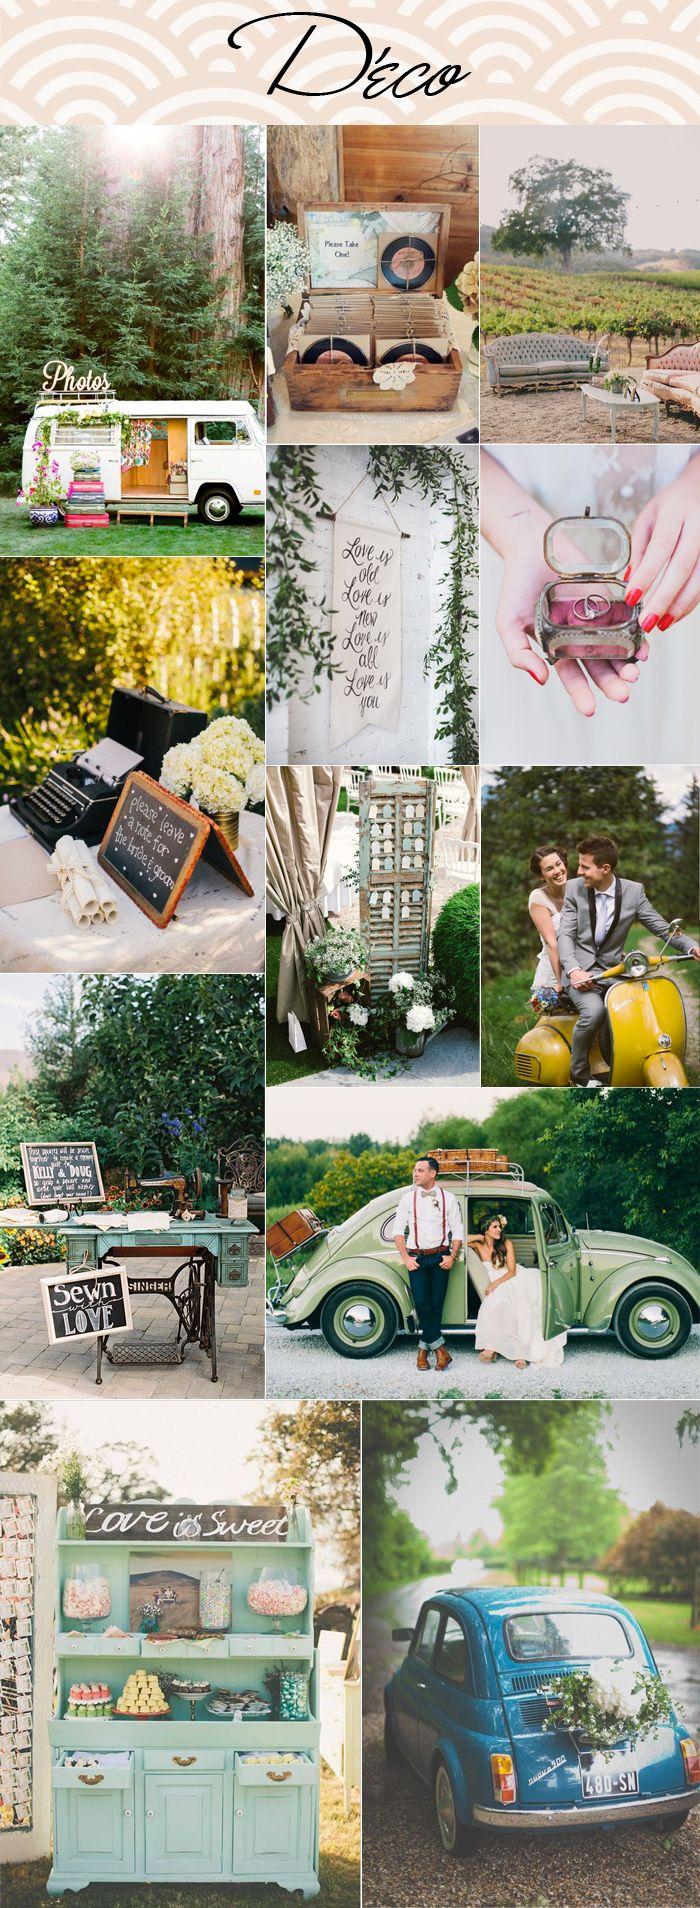 best Mariage images on Pinterest Wedding ideas Engagements